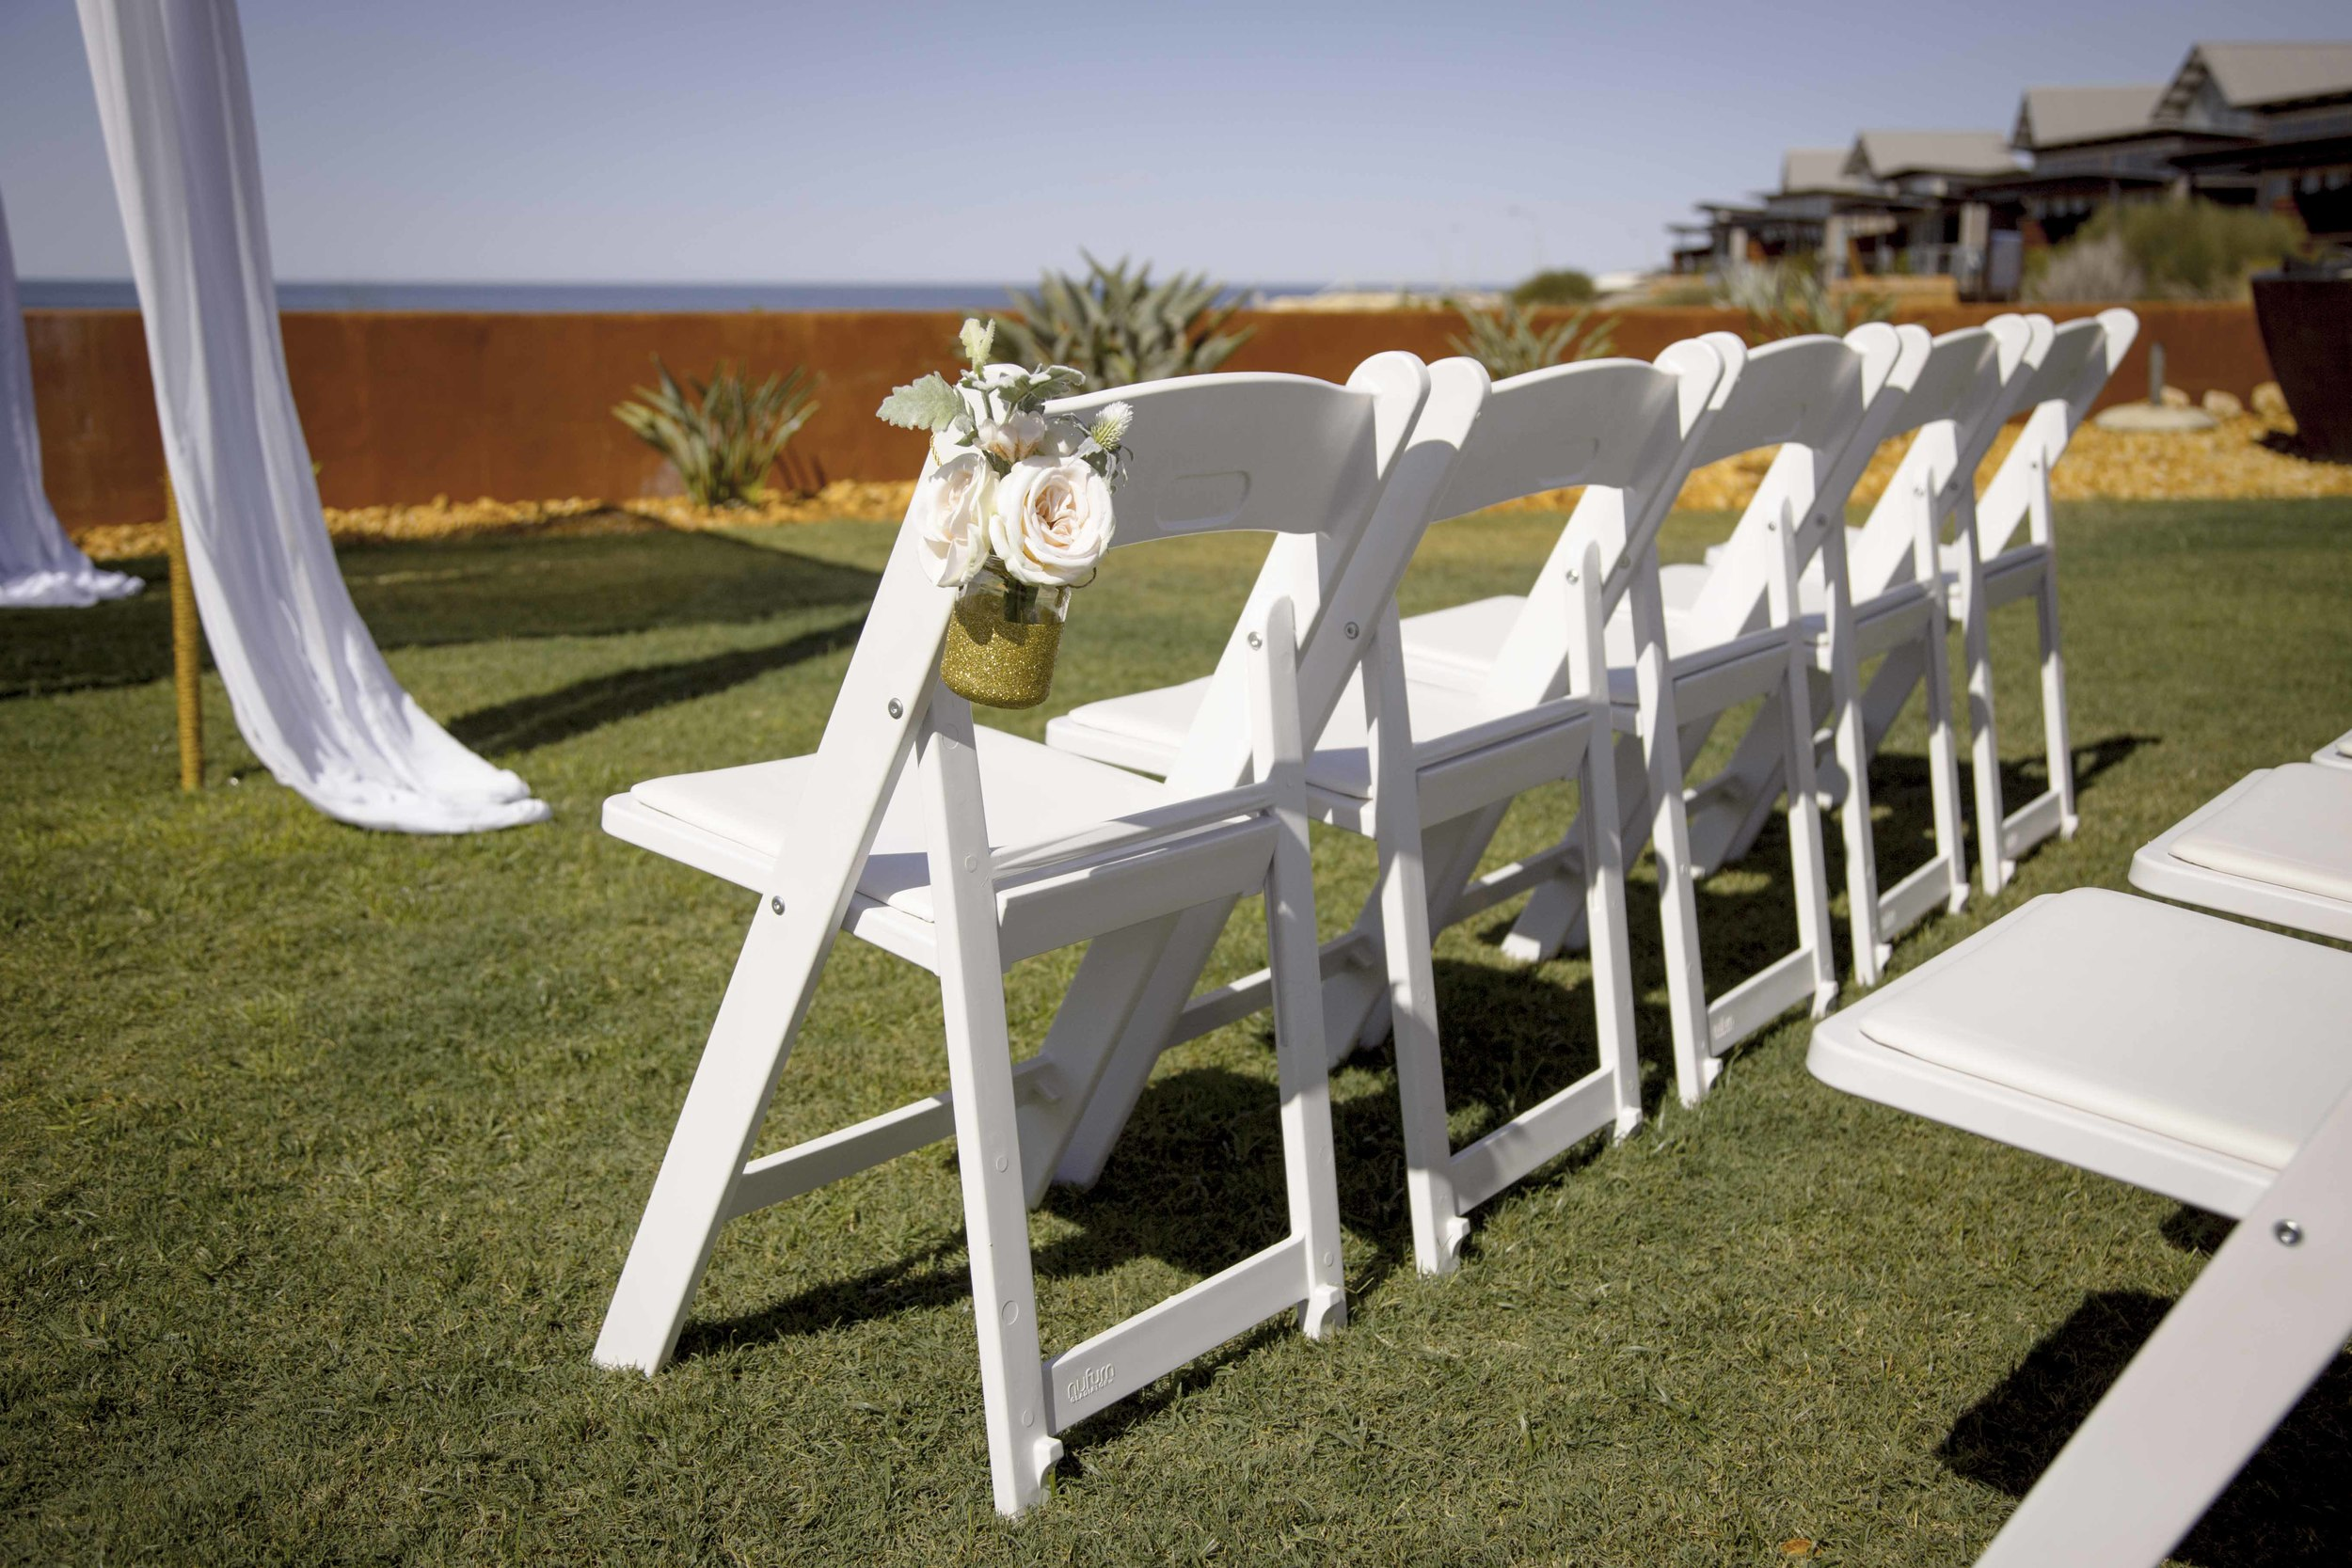 Gladiator Chairs, Hanging Vase & Artifical Floral Arrangement